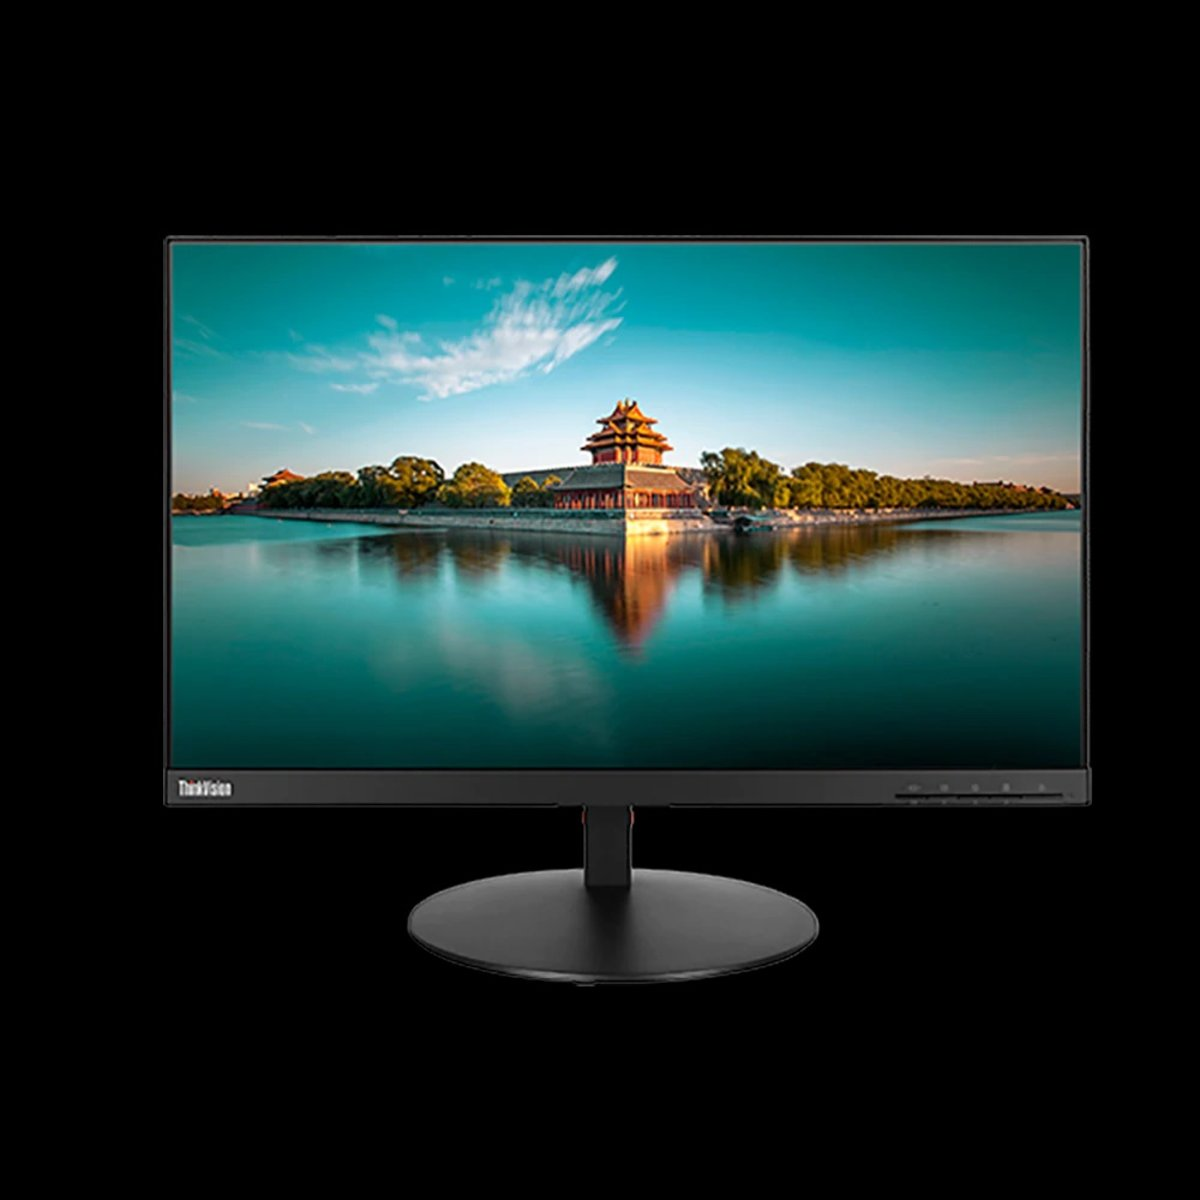 "THINKVISION T24I-10 (61A6MAR3WW / 61CEMAR2WW) 23.8"" FHD VGA+DISPLAYPORT+HDMI, Tilt, swivel, p"